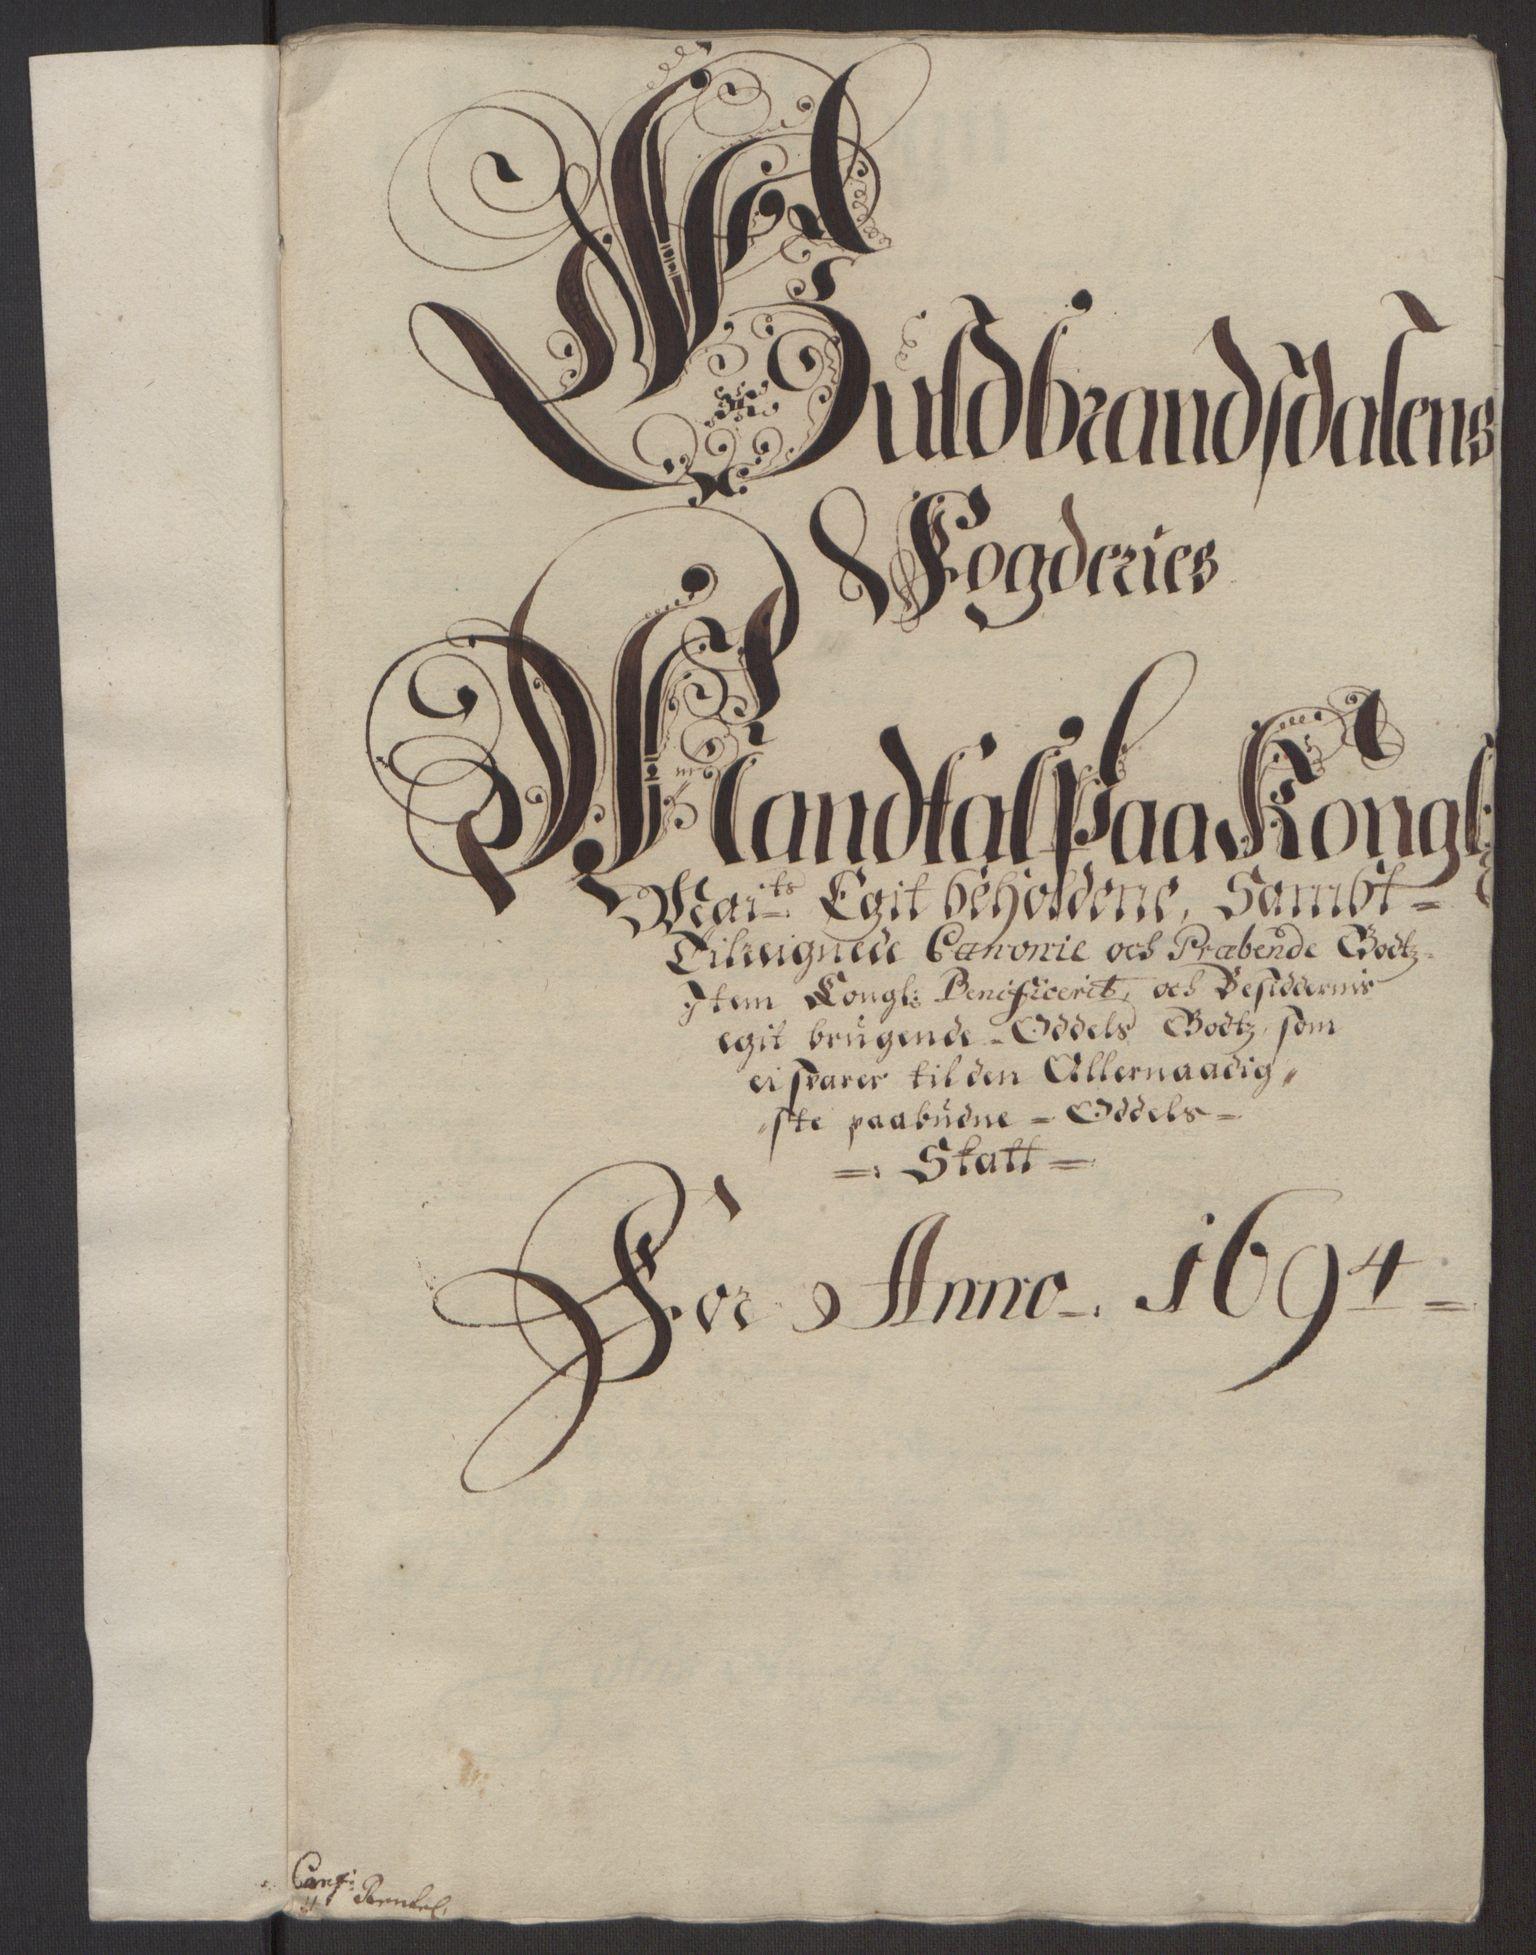 RA, Rentekammeret inntil 1814, Reviderte regnskaper, Fogderegnskap, R17/L1168: Fogderegnskap Gudbrandsdal, 1694, s. 307